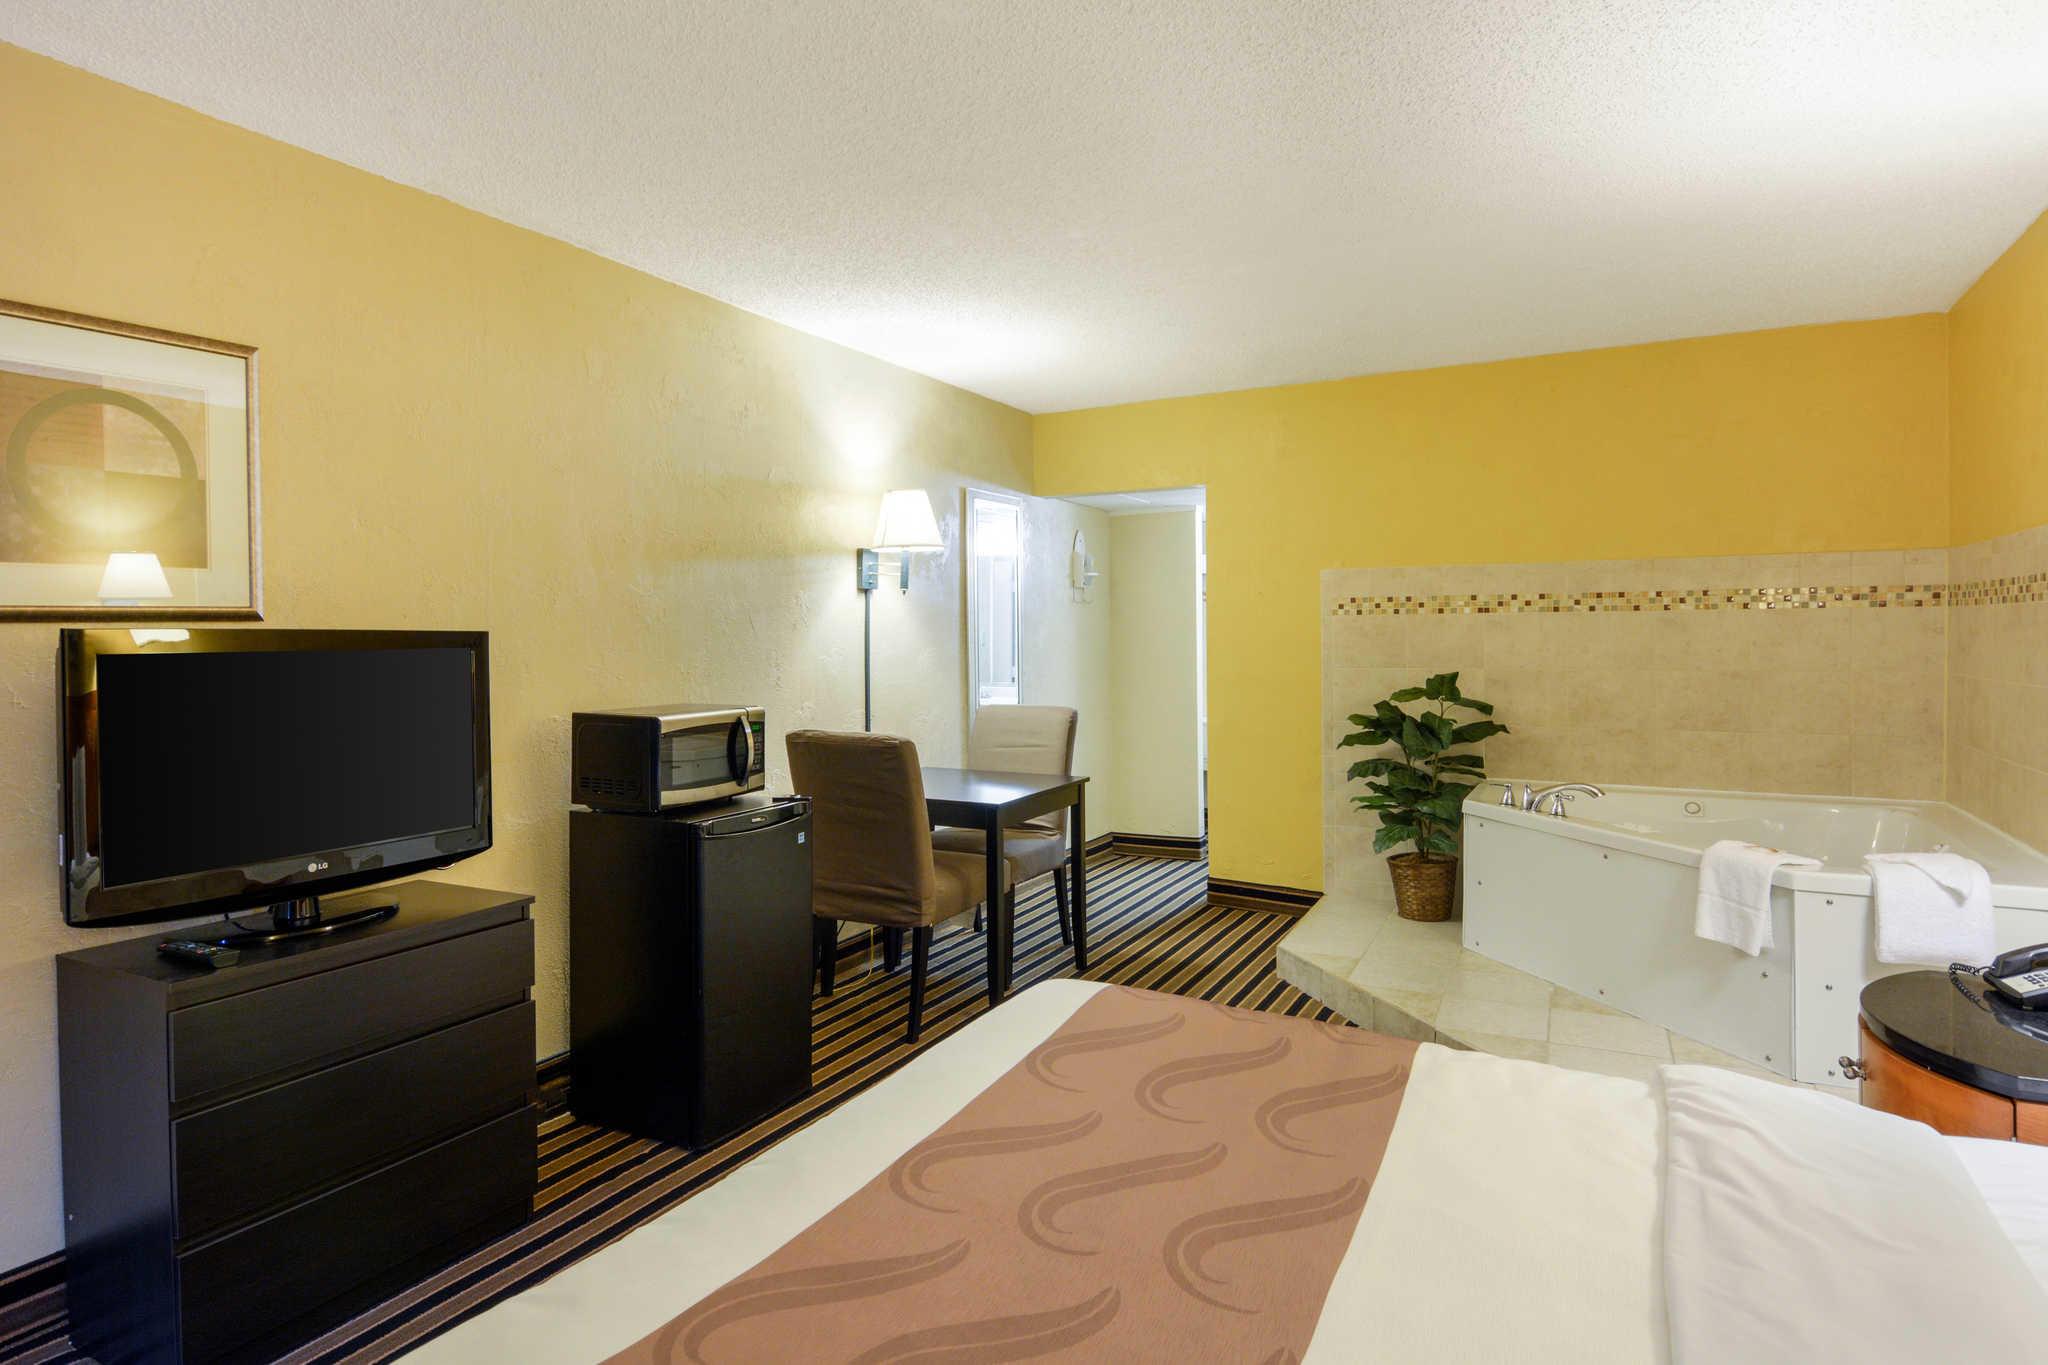 Quality Inn Skyline Drive image 23